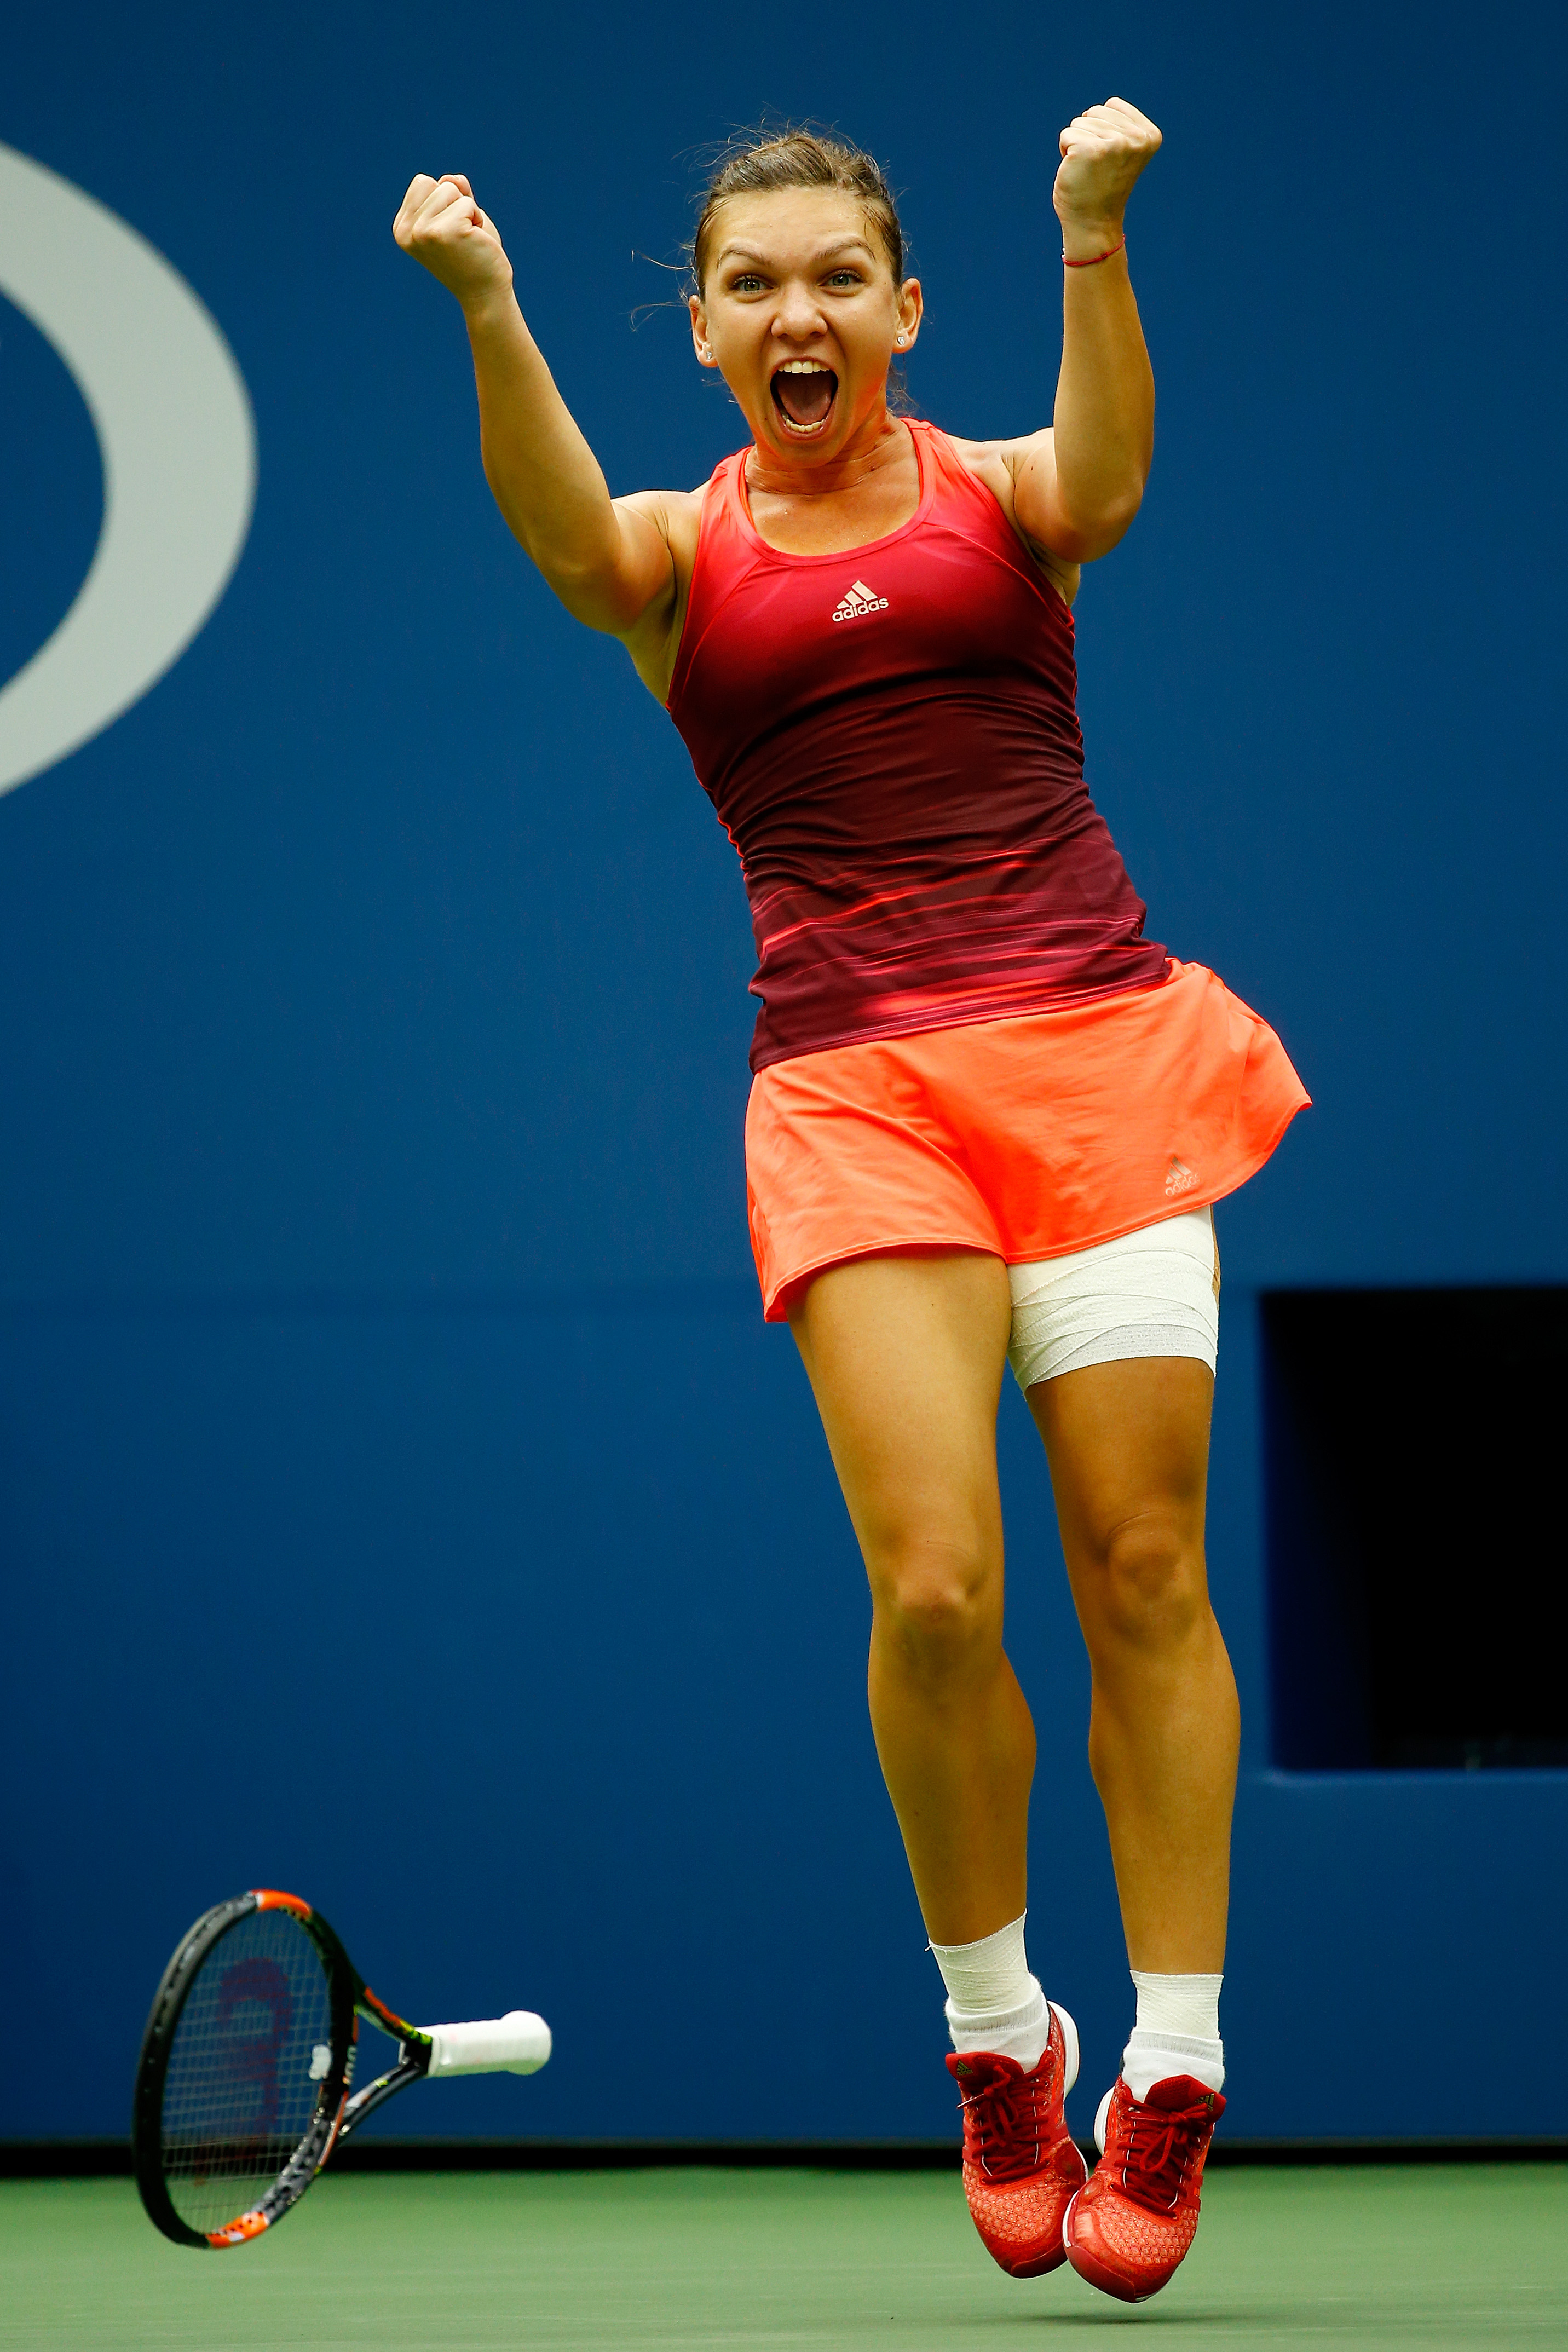 US Open women's semifinals preview: Serena-Vinci, Halep-Pennetta | SI.com